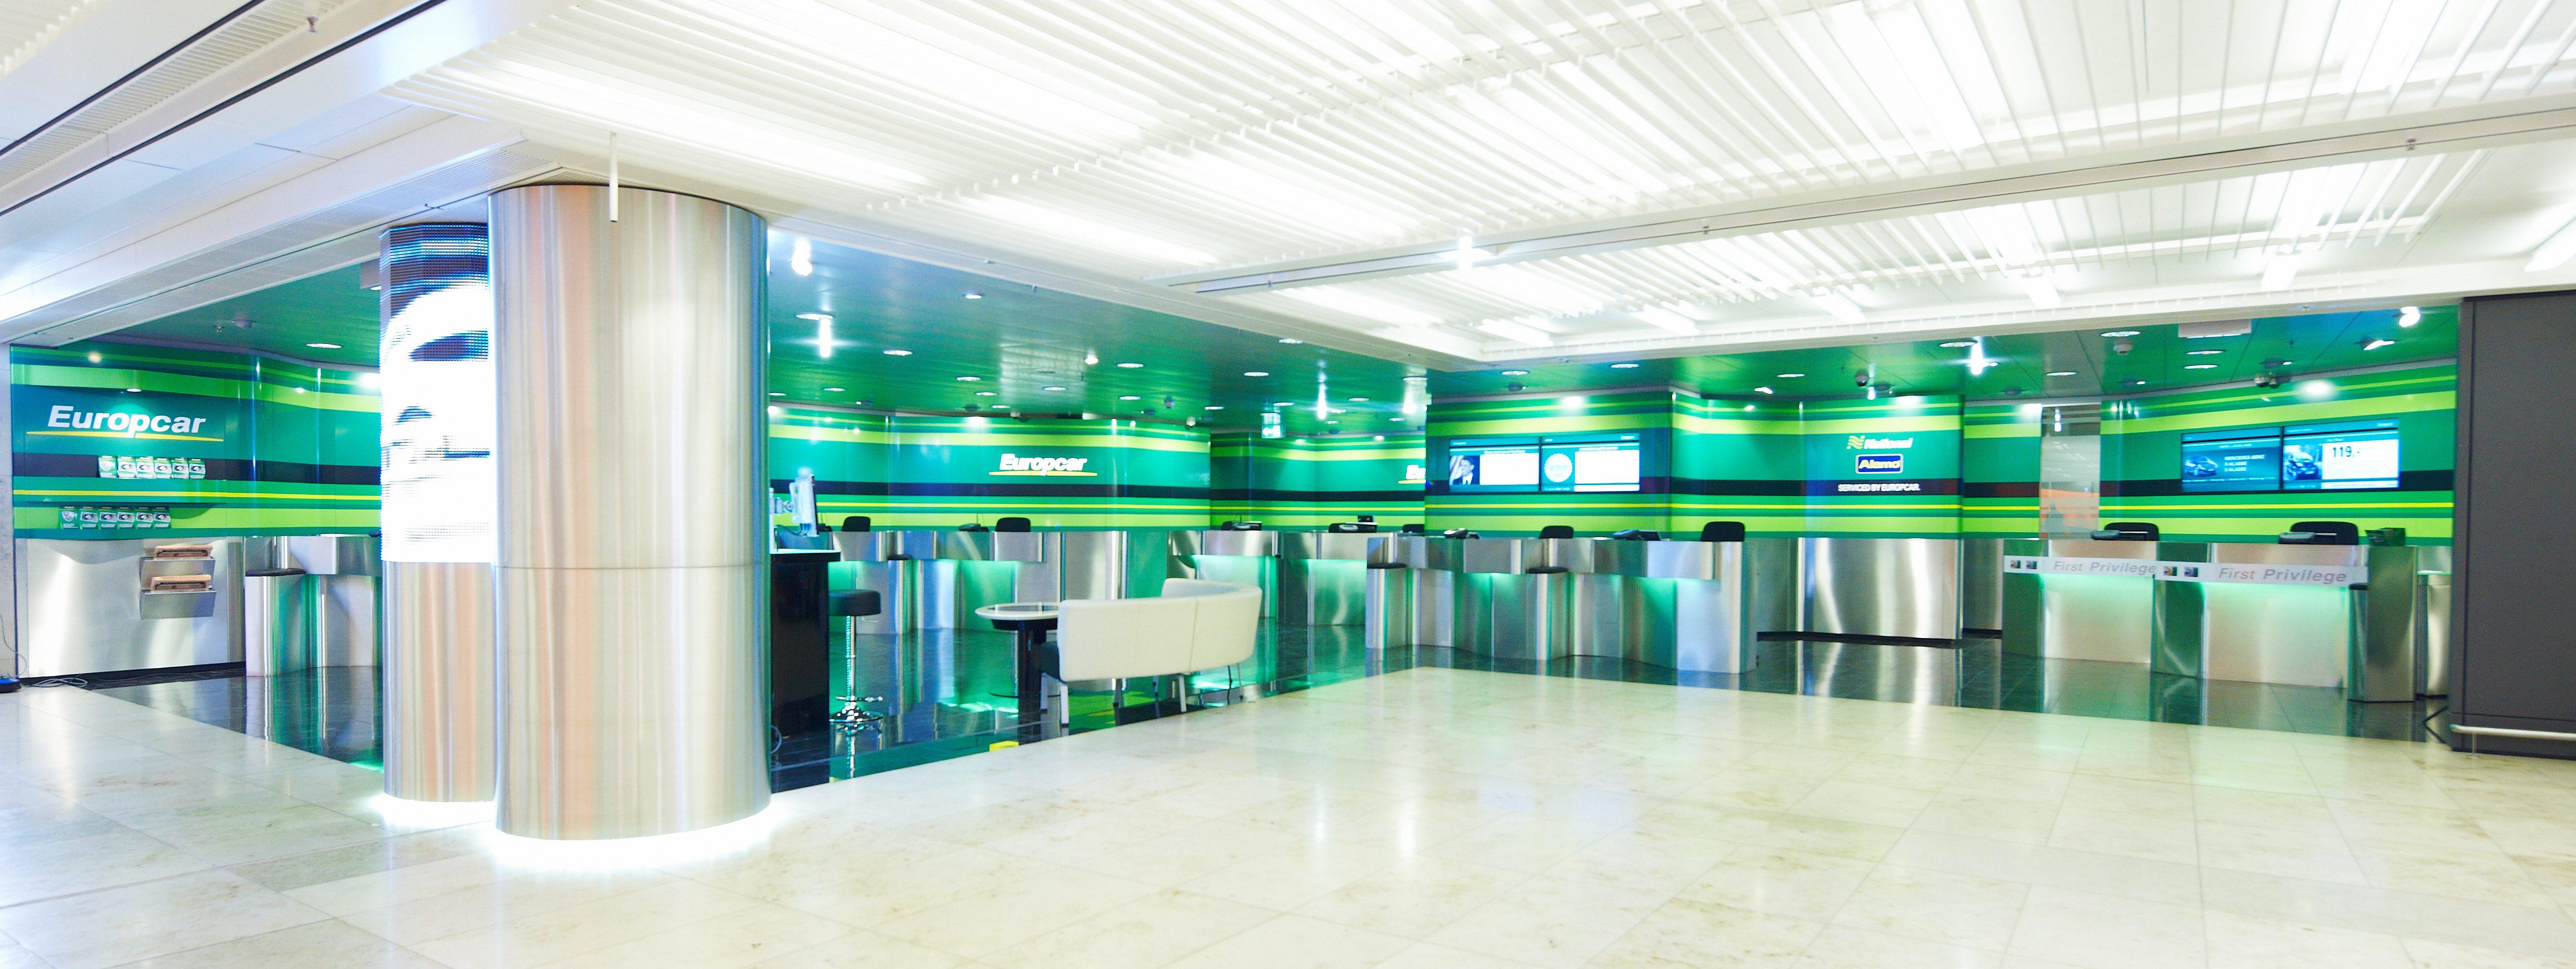 Europcar Station Frankfurt Airport Foto Europcar Atudo